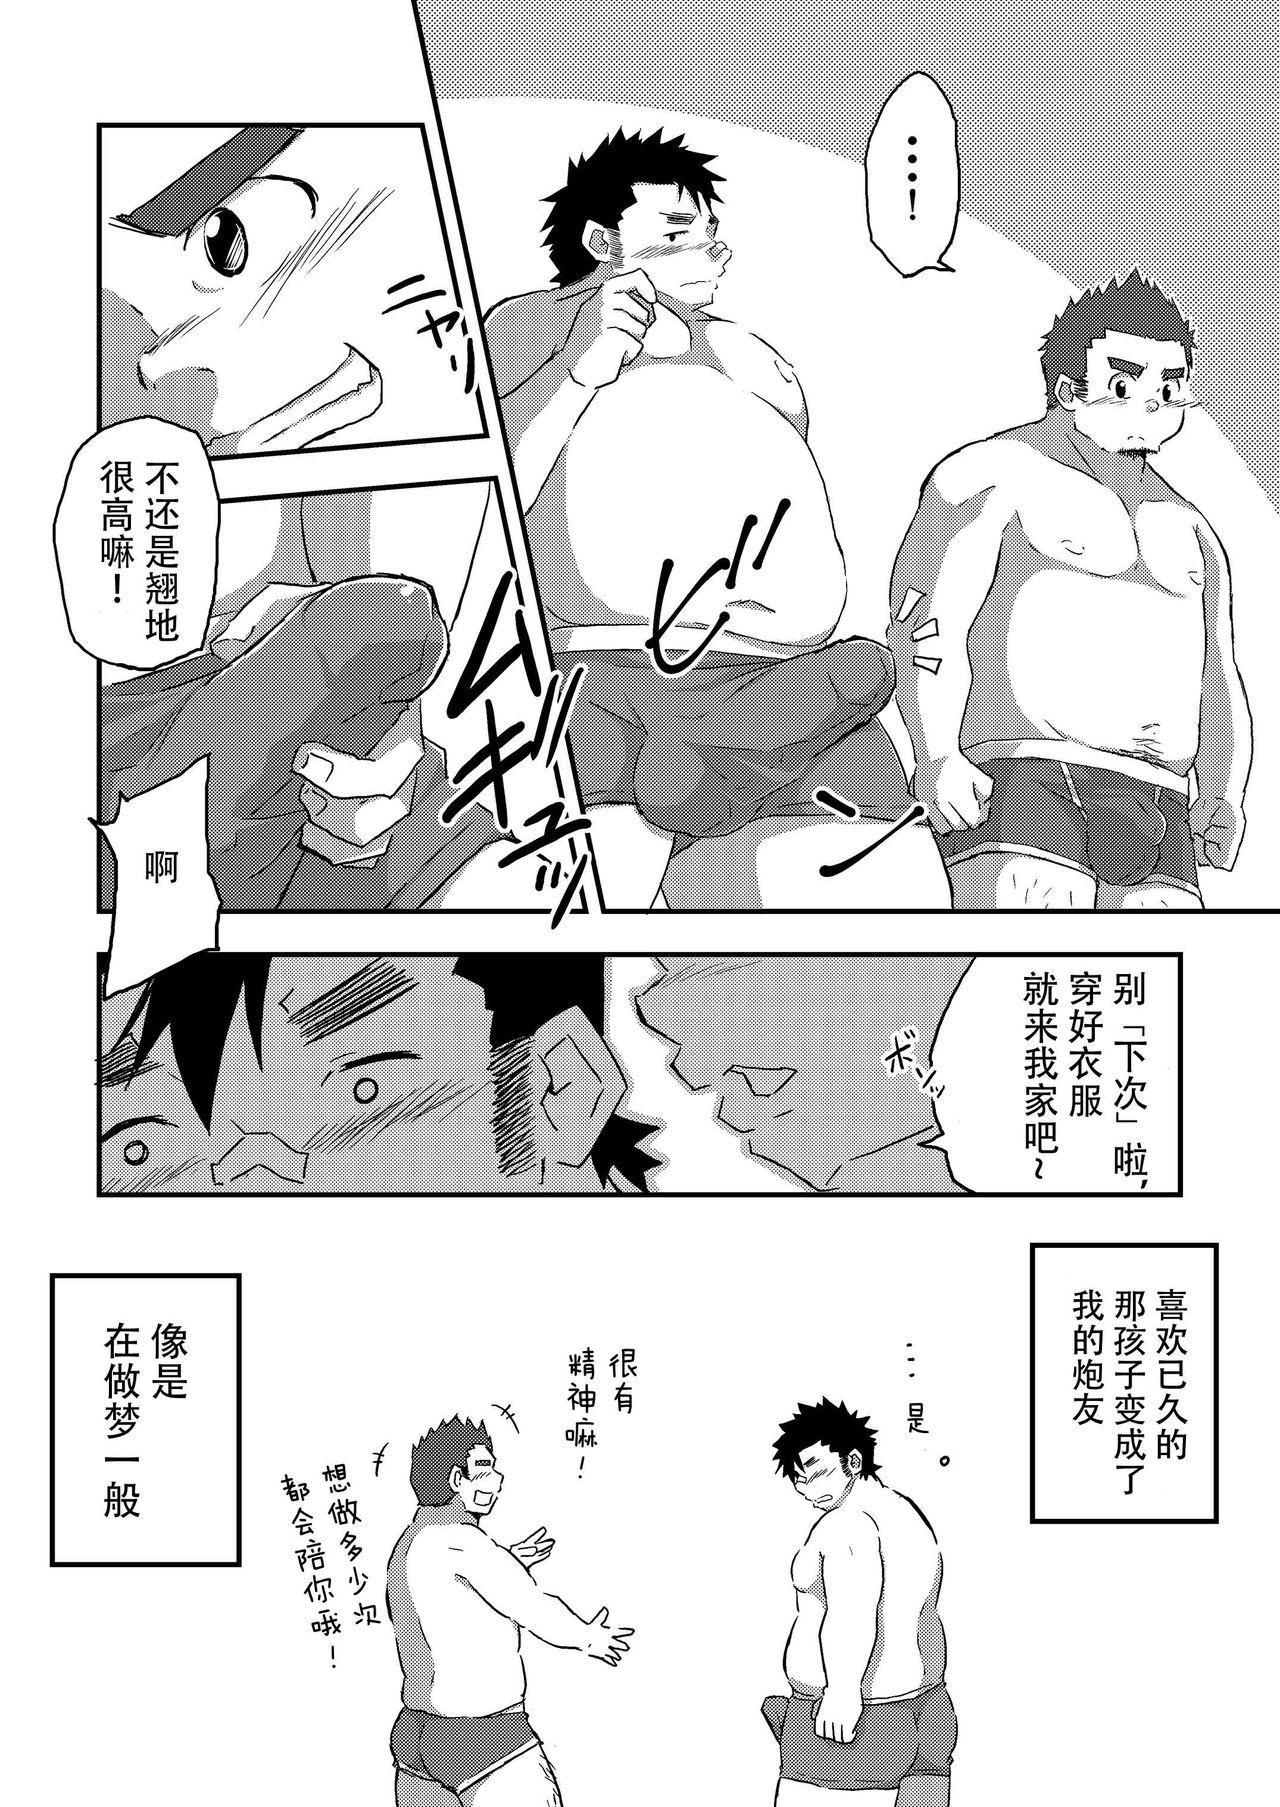 [CorkBOX (ngng)] Ise-kun wa Tamatte Iru. - Ise-kun is horny. [Chinese] {日曜日汉化} [Digital] 28